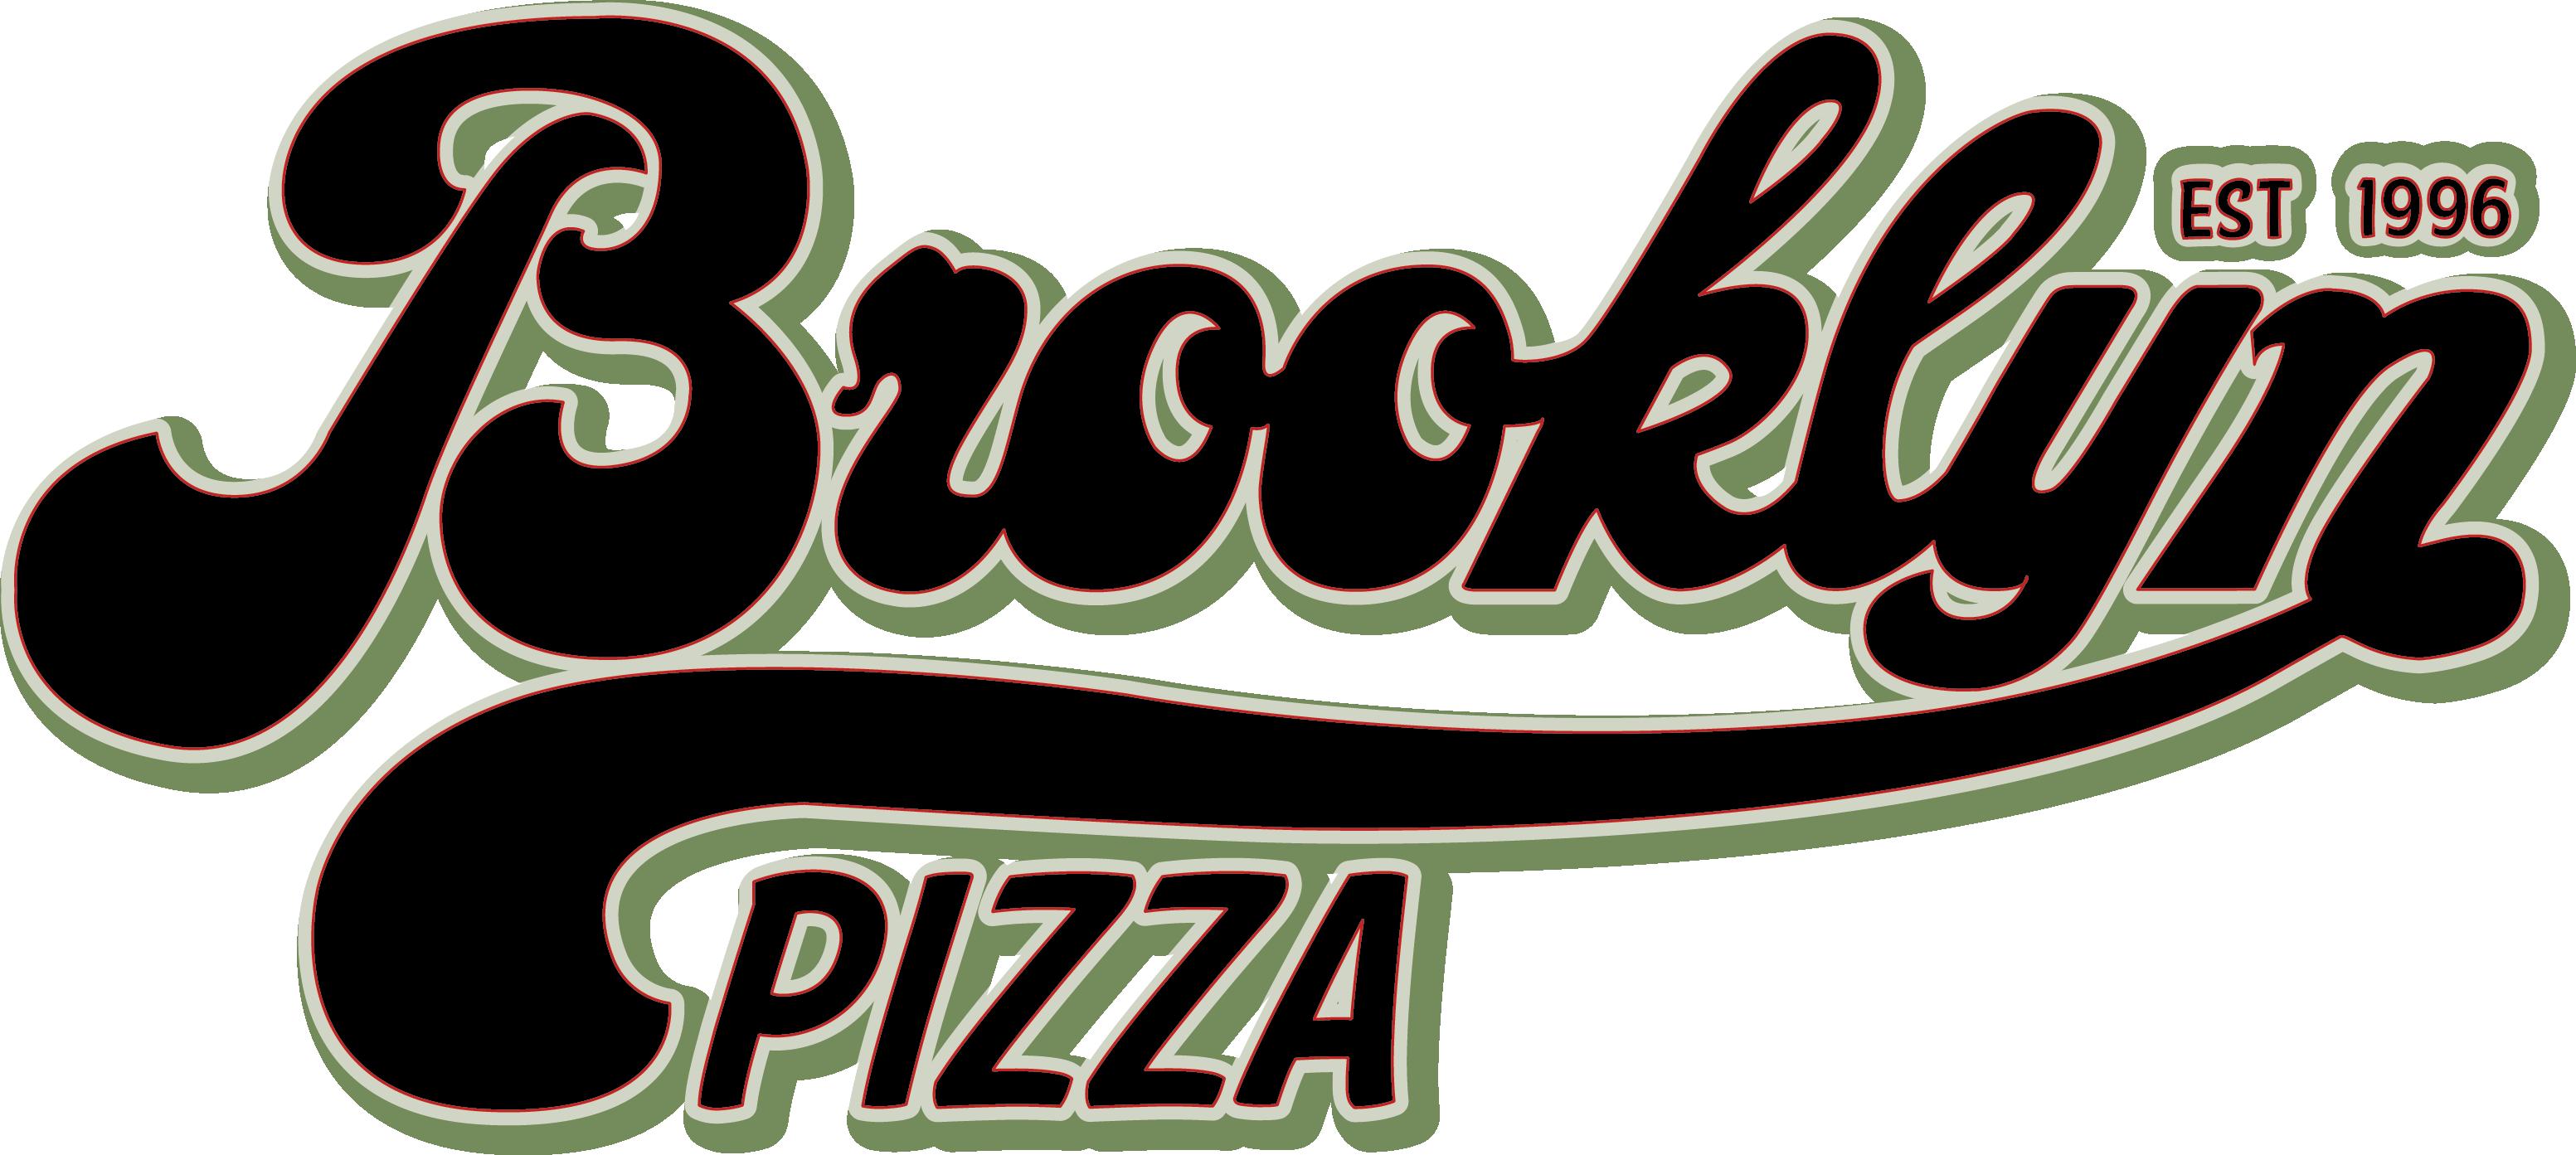 The Brooklyn Pizza